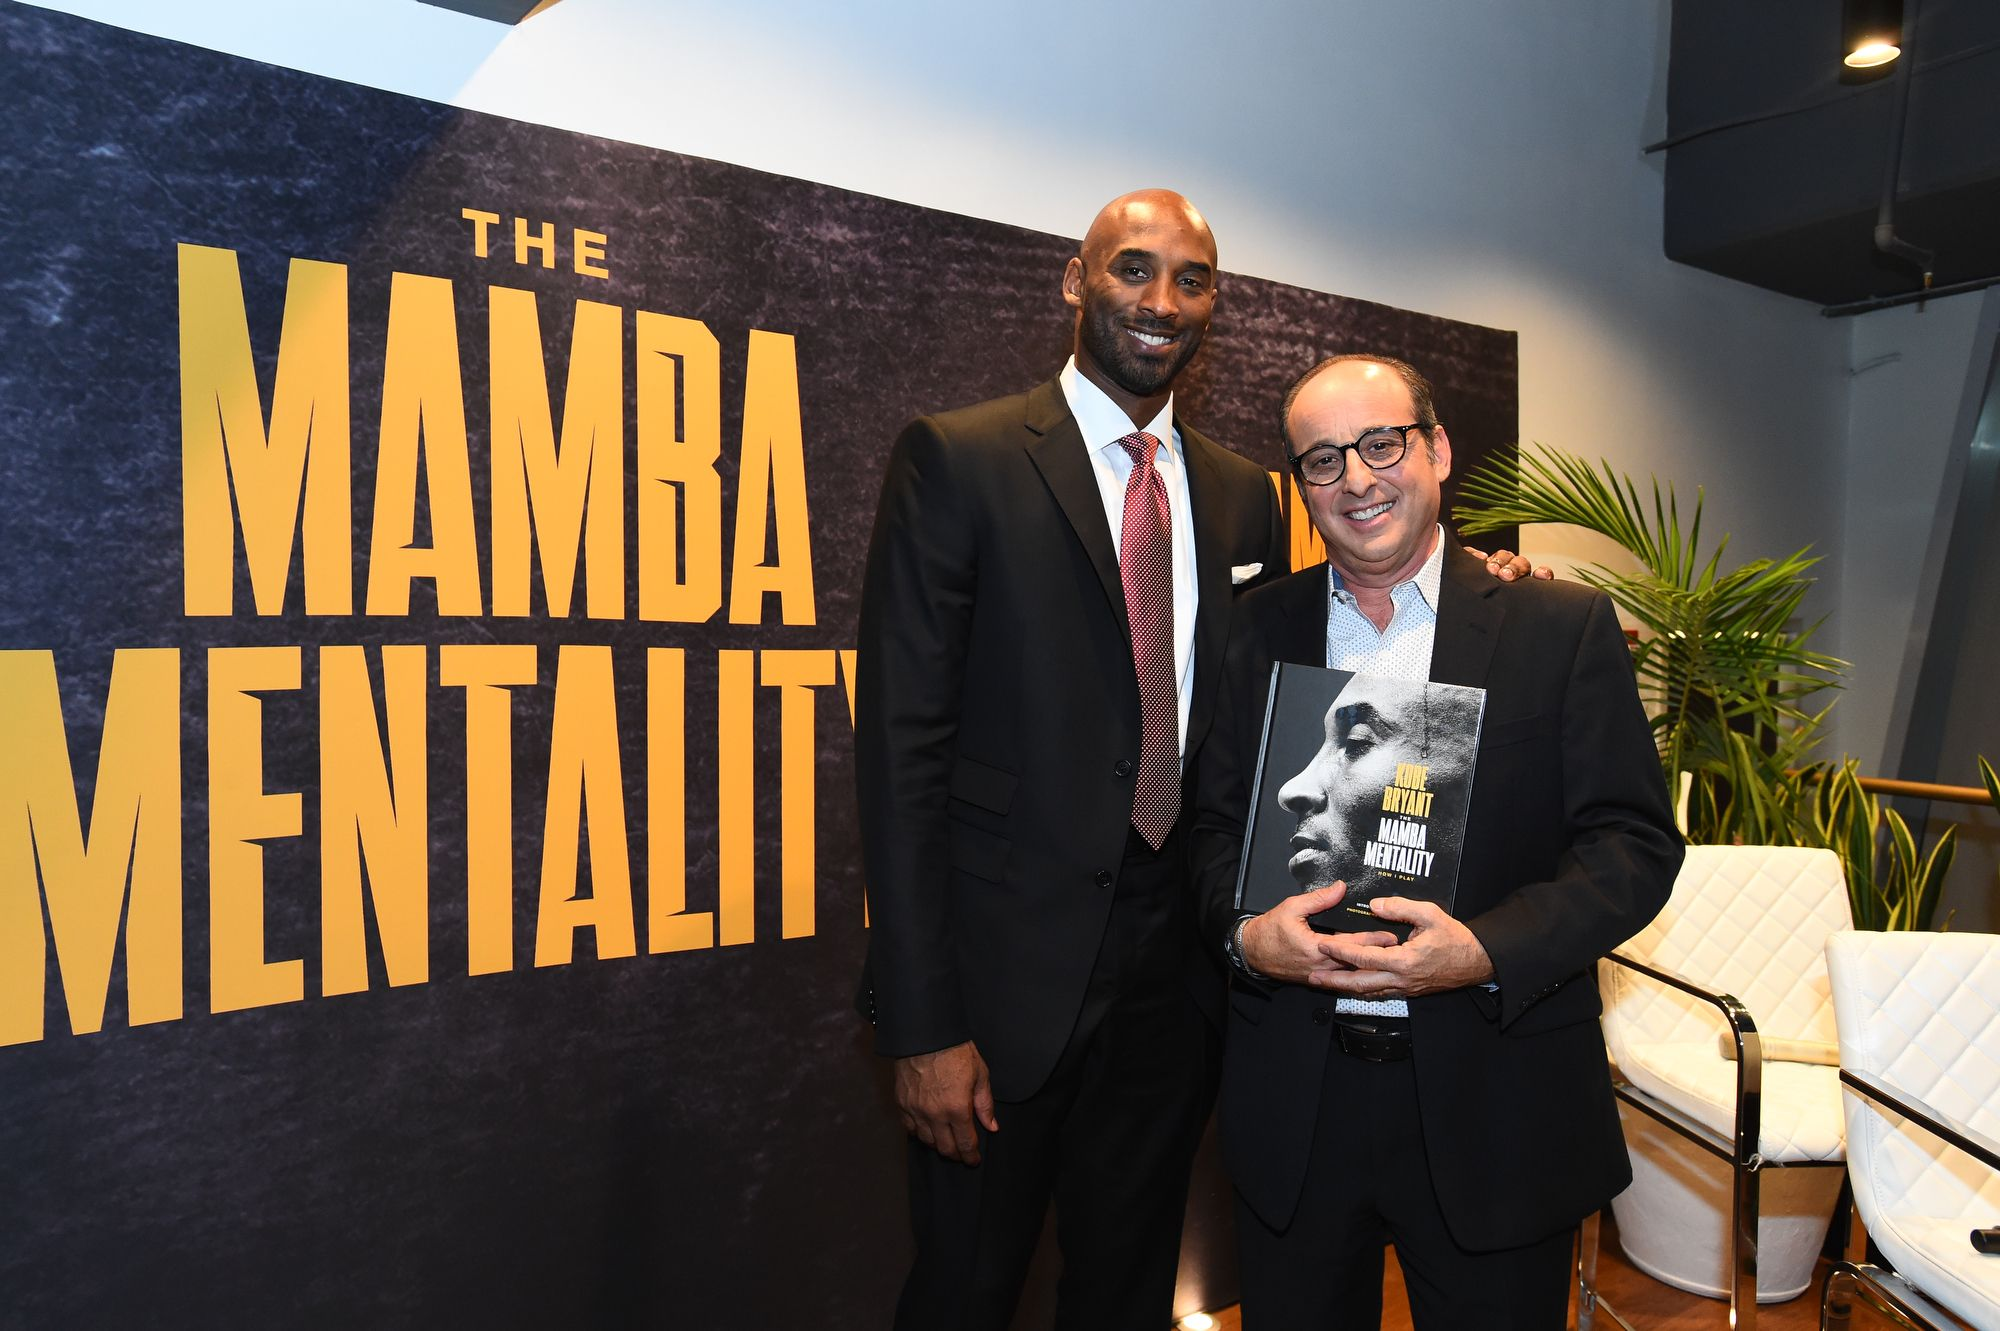 Andrew Bernstein et Kobe Bryant